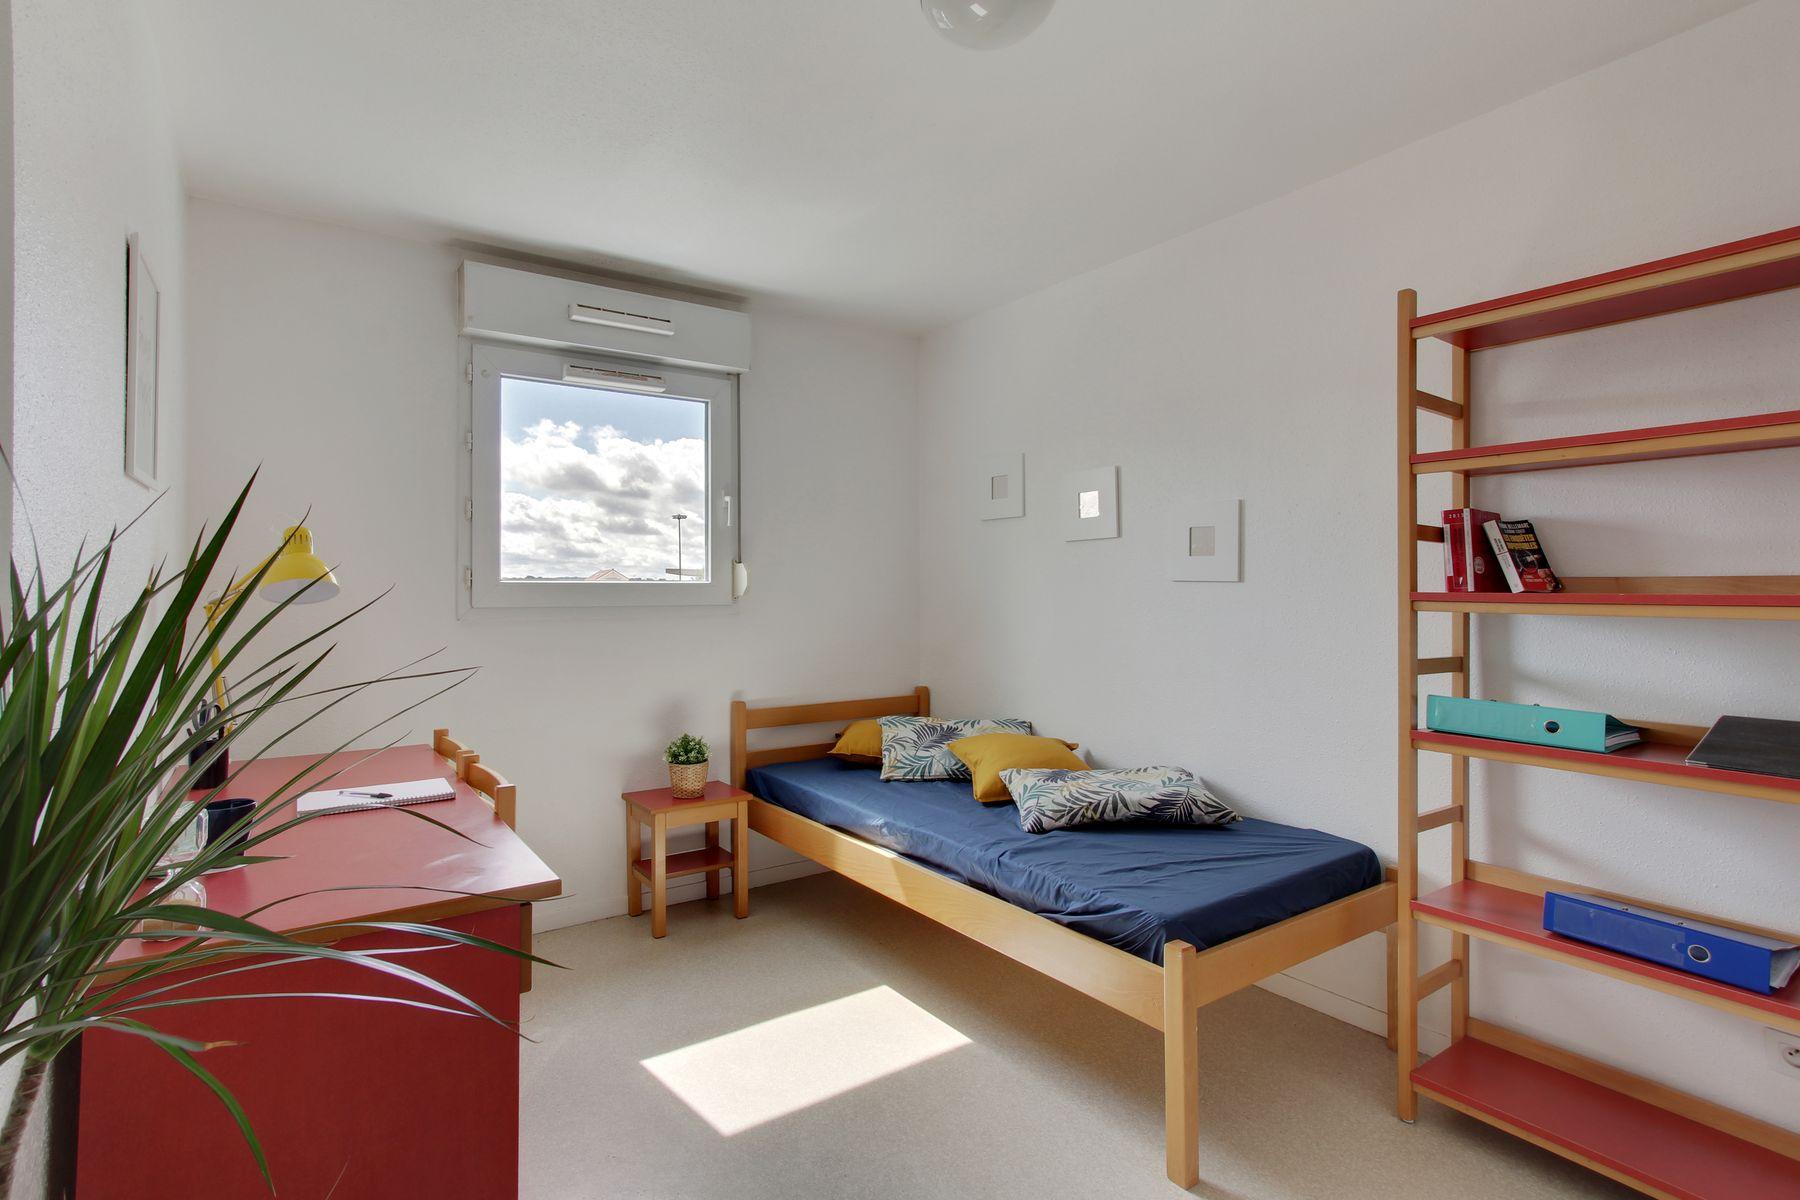 LOGIFAC résidence étudiante Abelard Melun bureau lit rangement